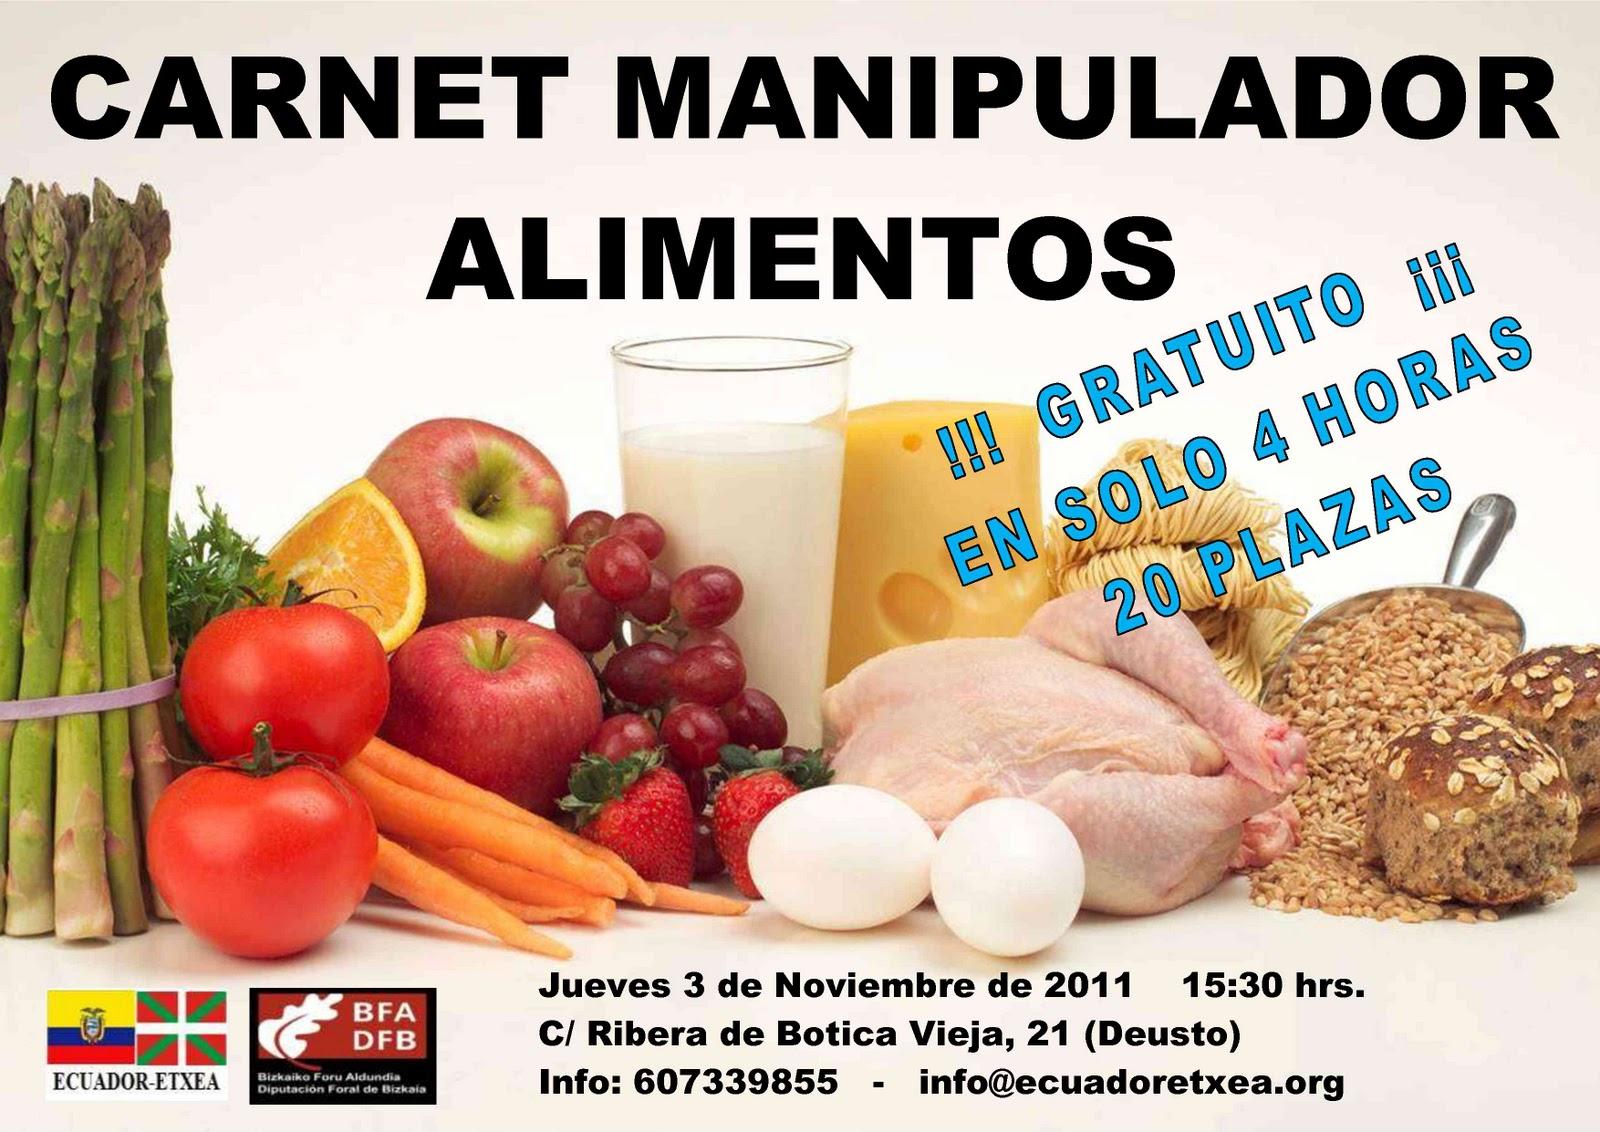 Ecuador etxea oficial curso carnet de manipulador de alimentos gratuito dfb - Certificado de manipulador de alimentos gratis online ...